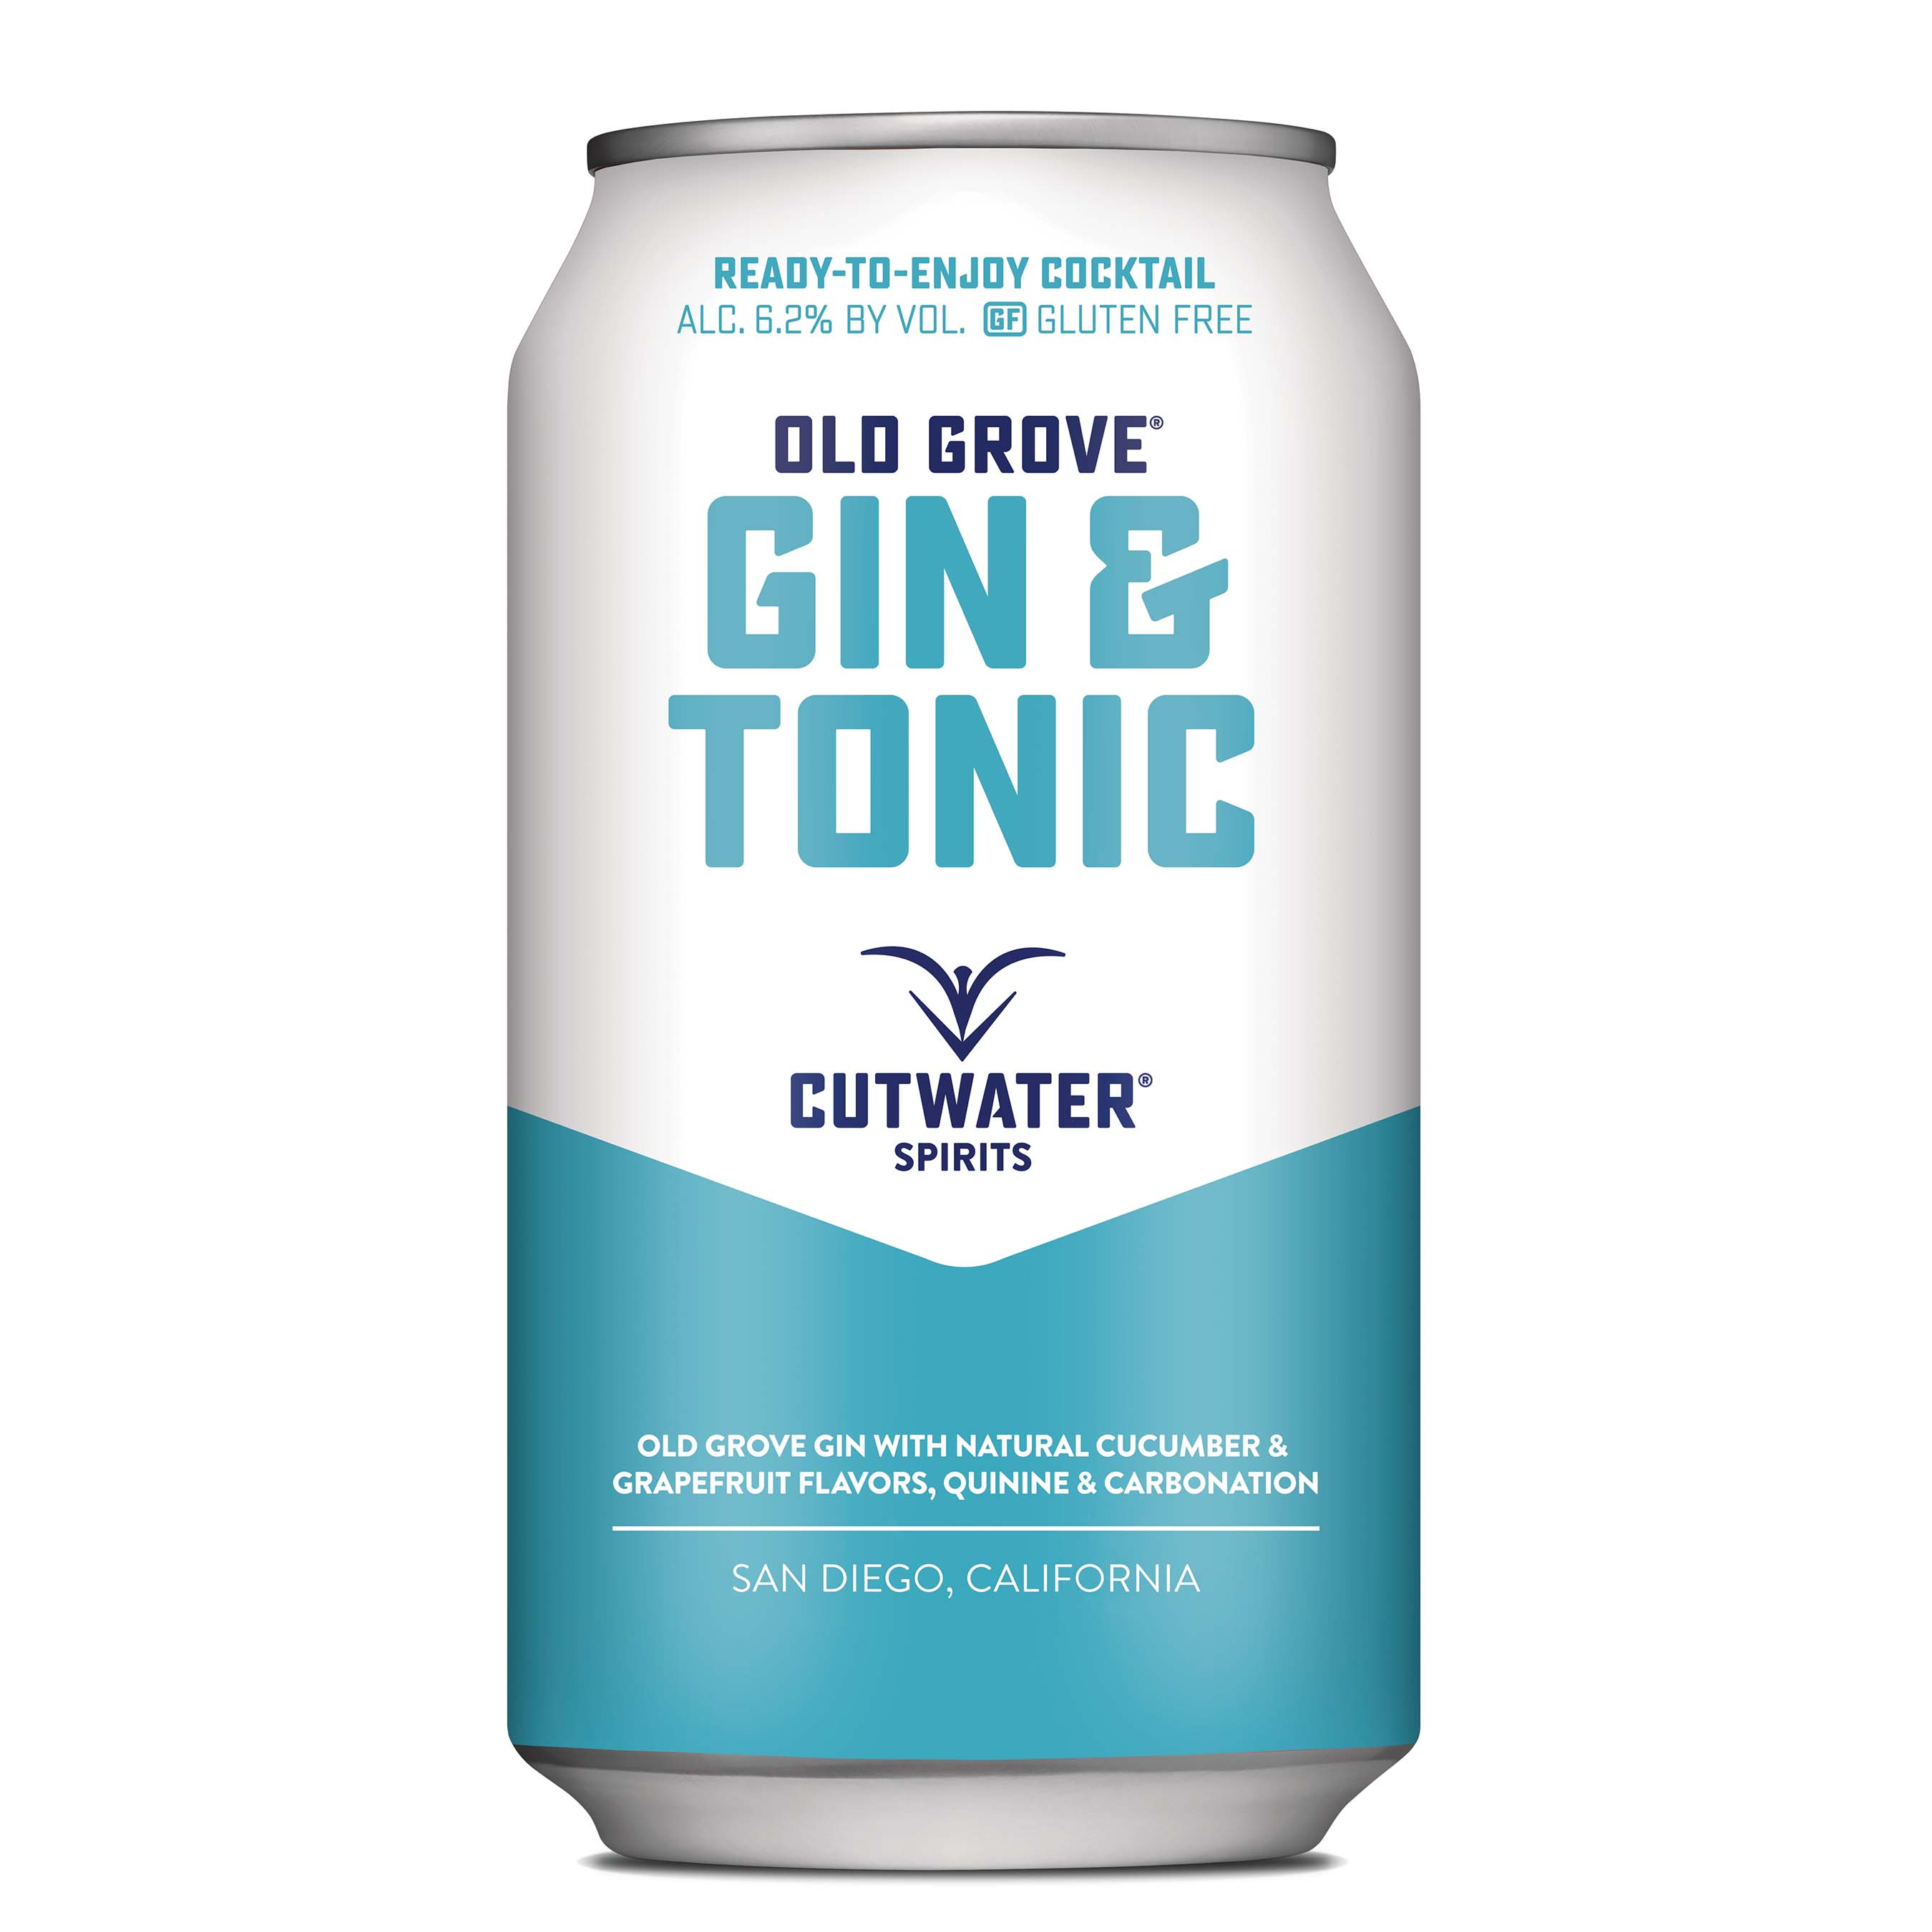 Cutwater, Gin & Tonic